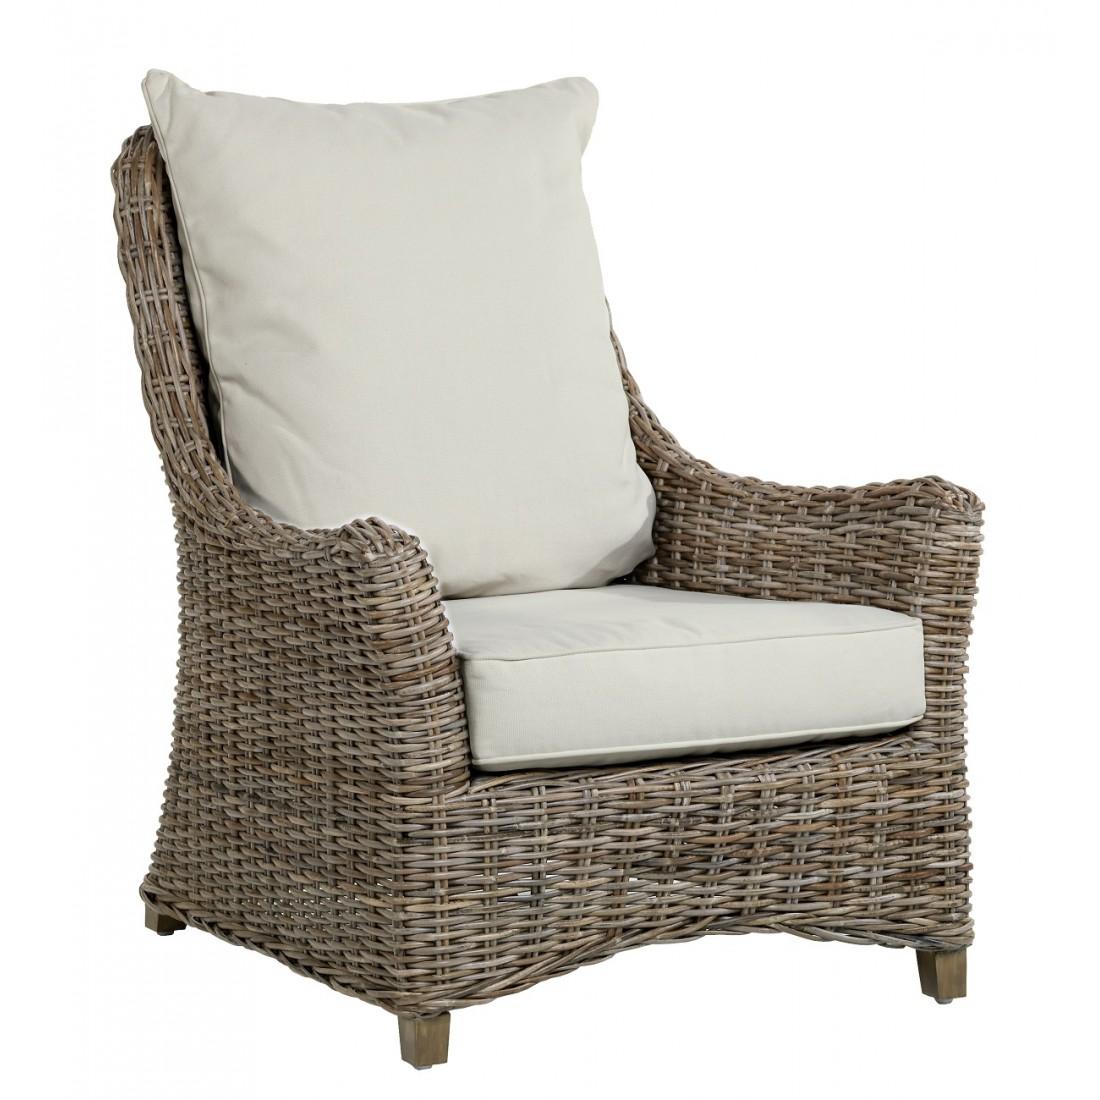 fauteuil rotin kooboo gris transat fauteuil rotin kok uk. Black Bedroom Furniture Sets. Home Design Ideas